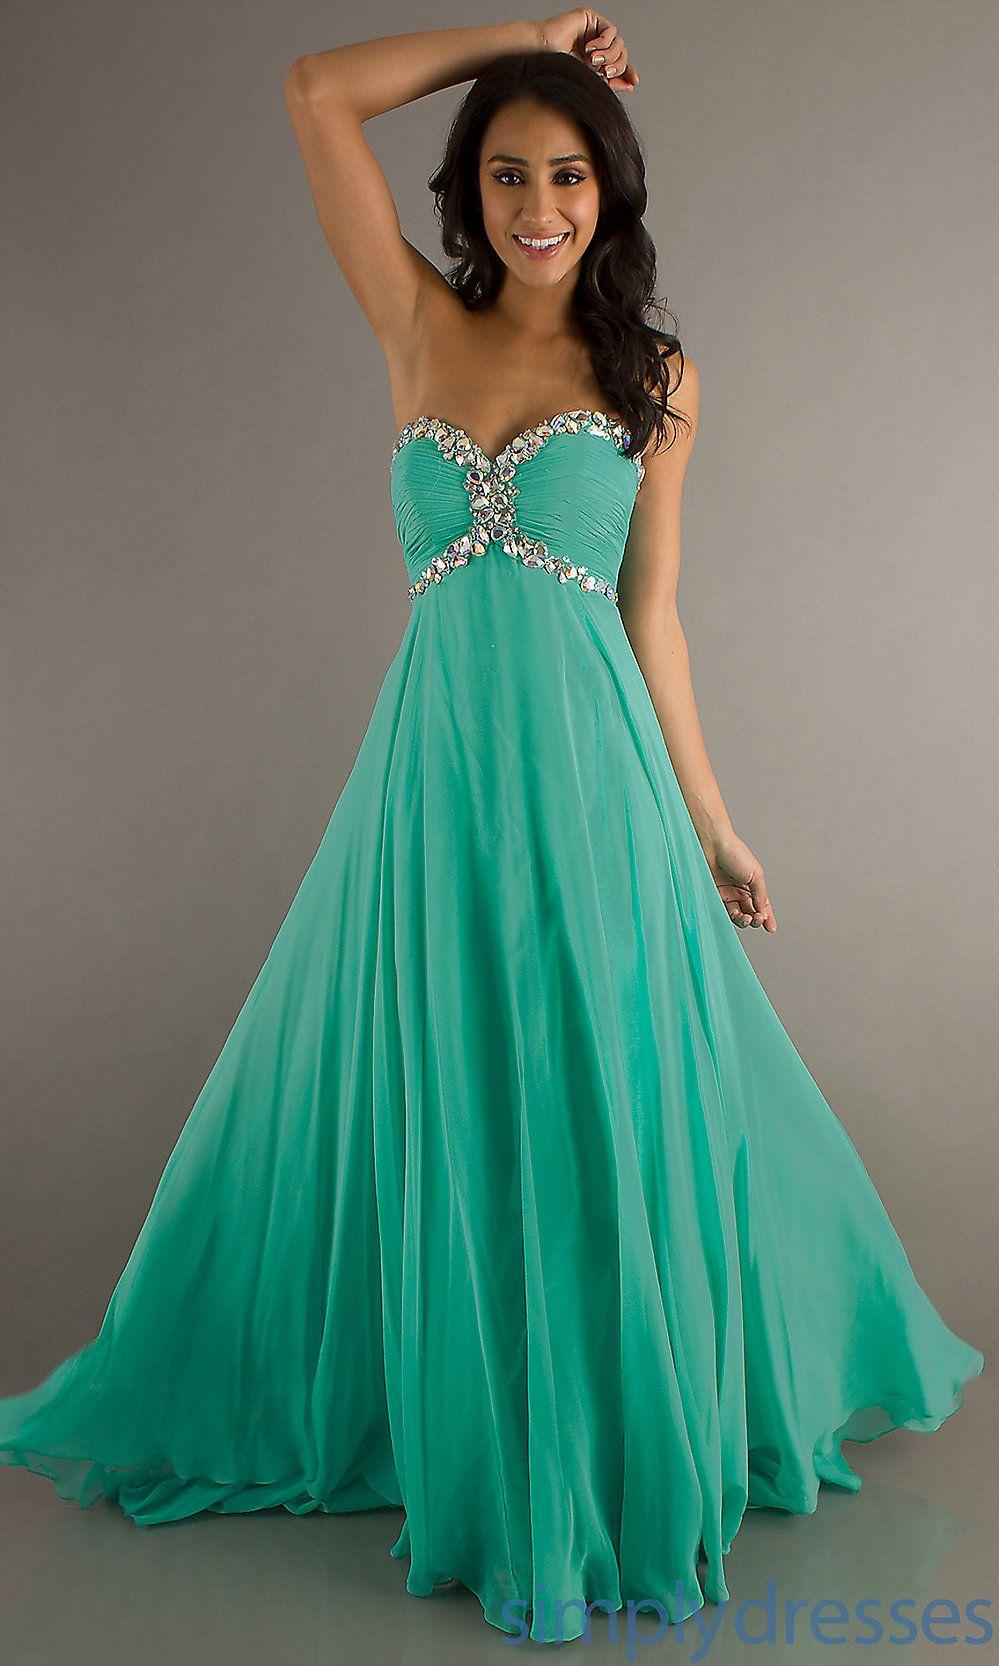 Dresses formal prom dresses evening wear classic strapless